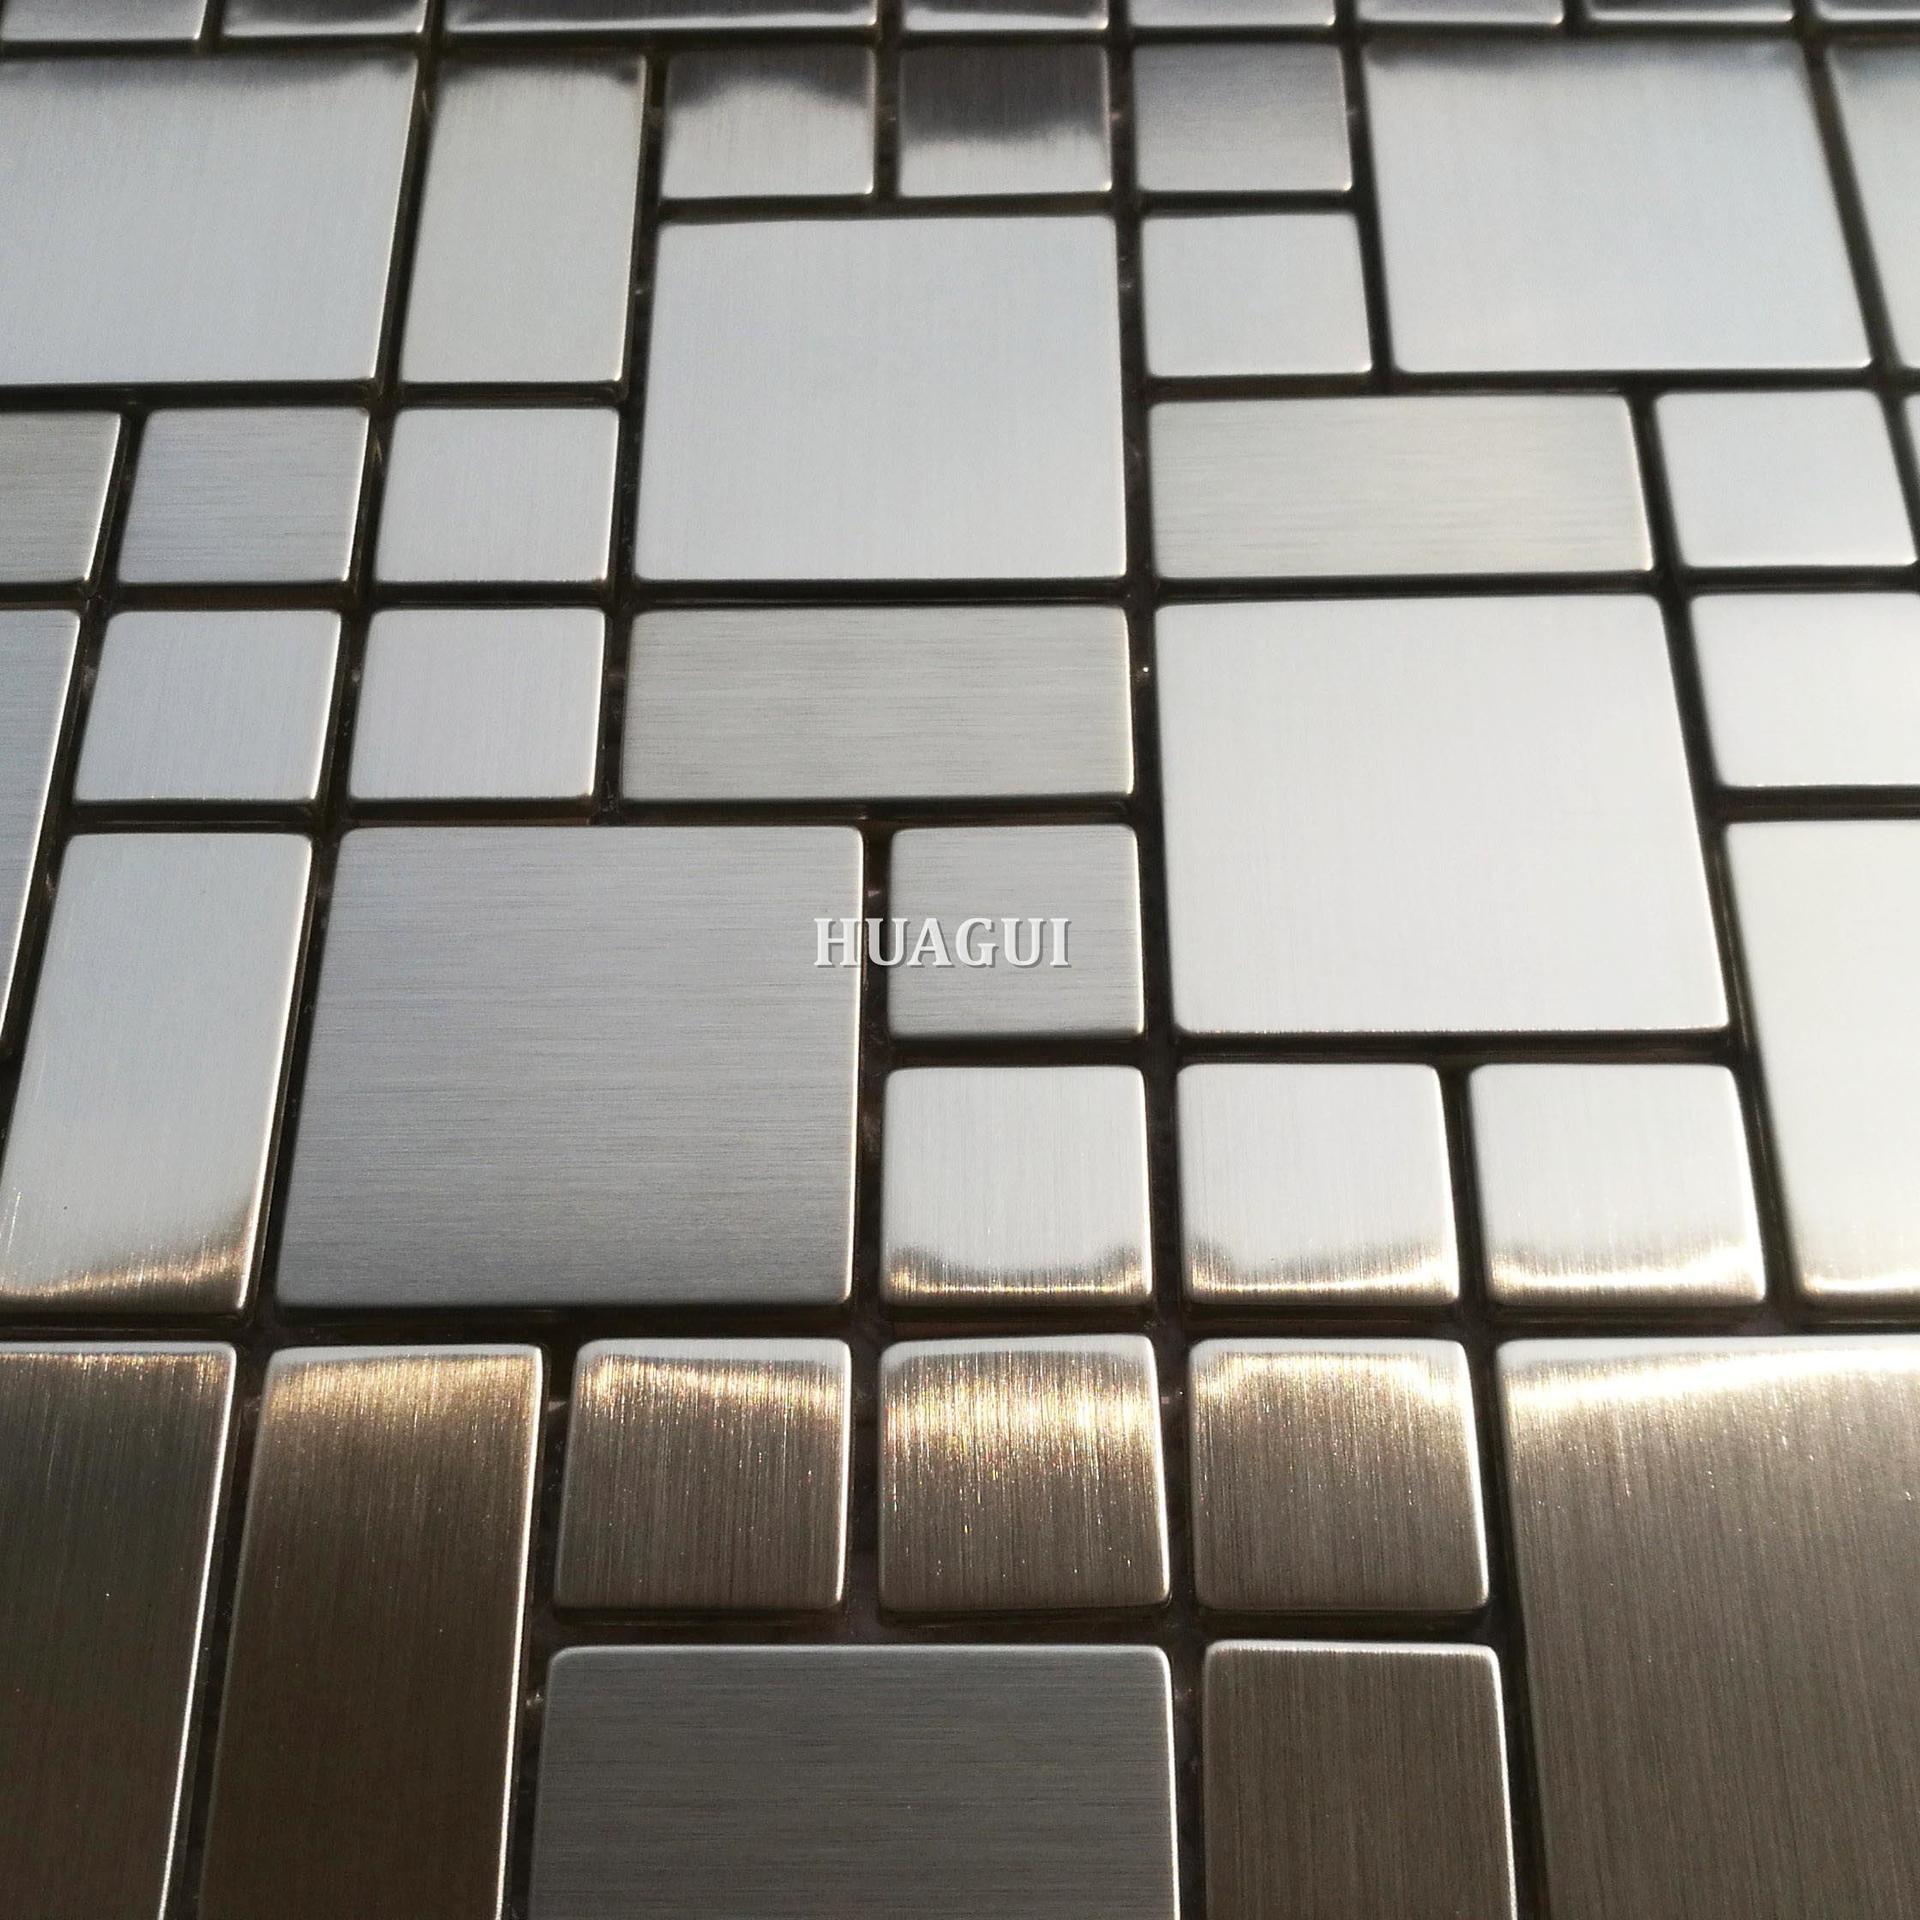 Stainless steel brick mosaic metal wall backsplash tile for sale